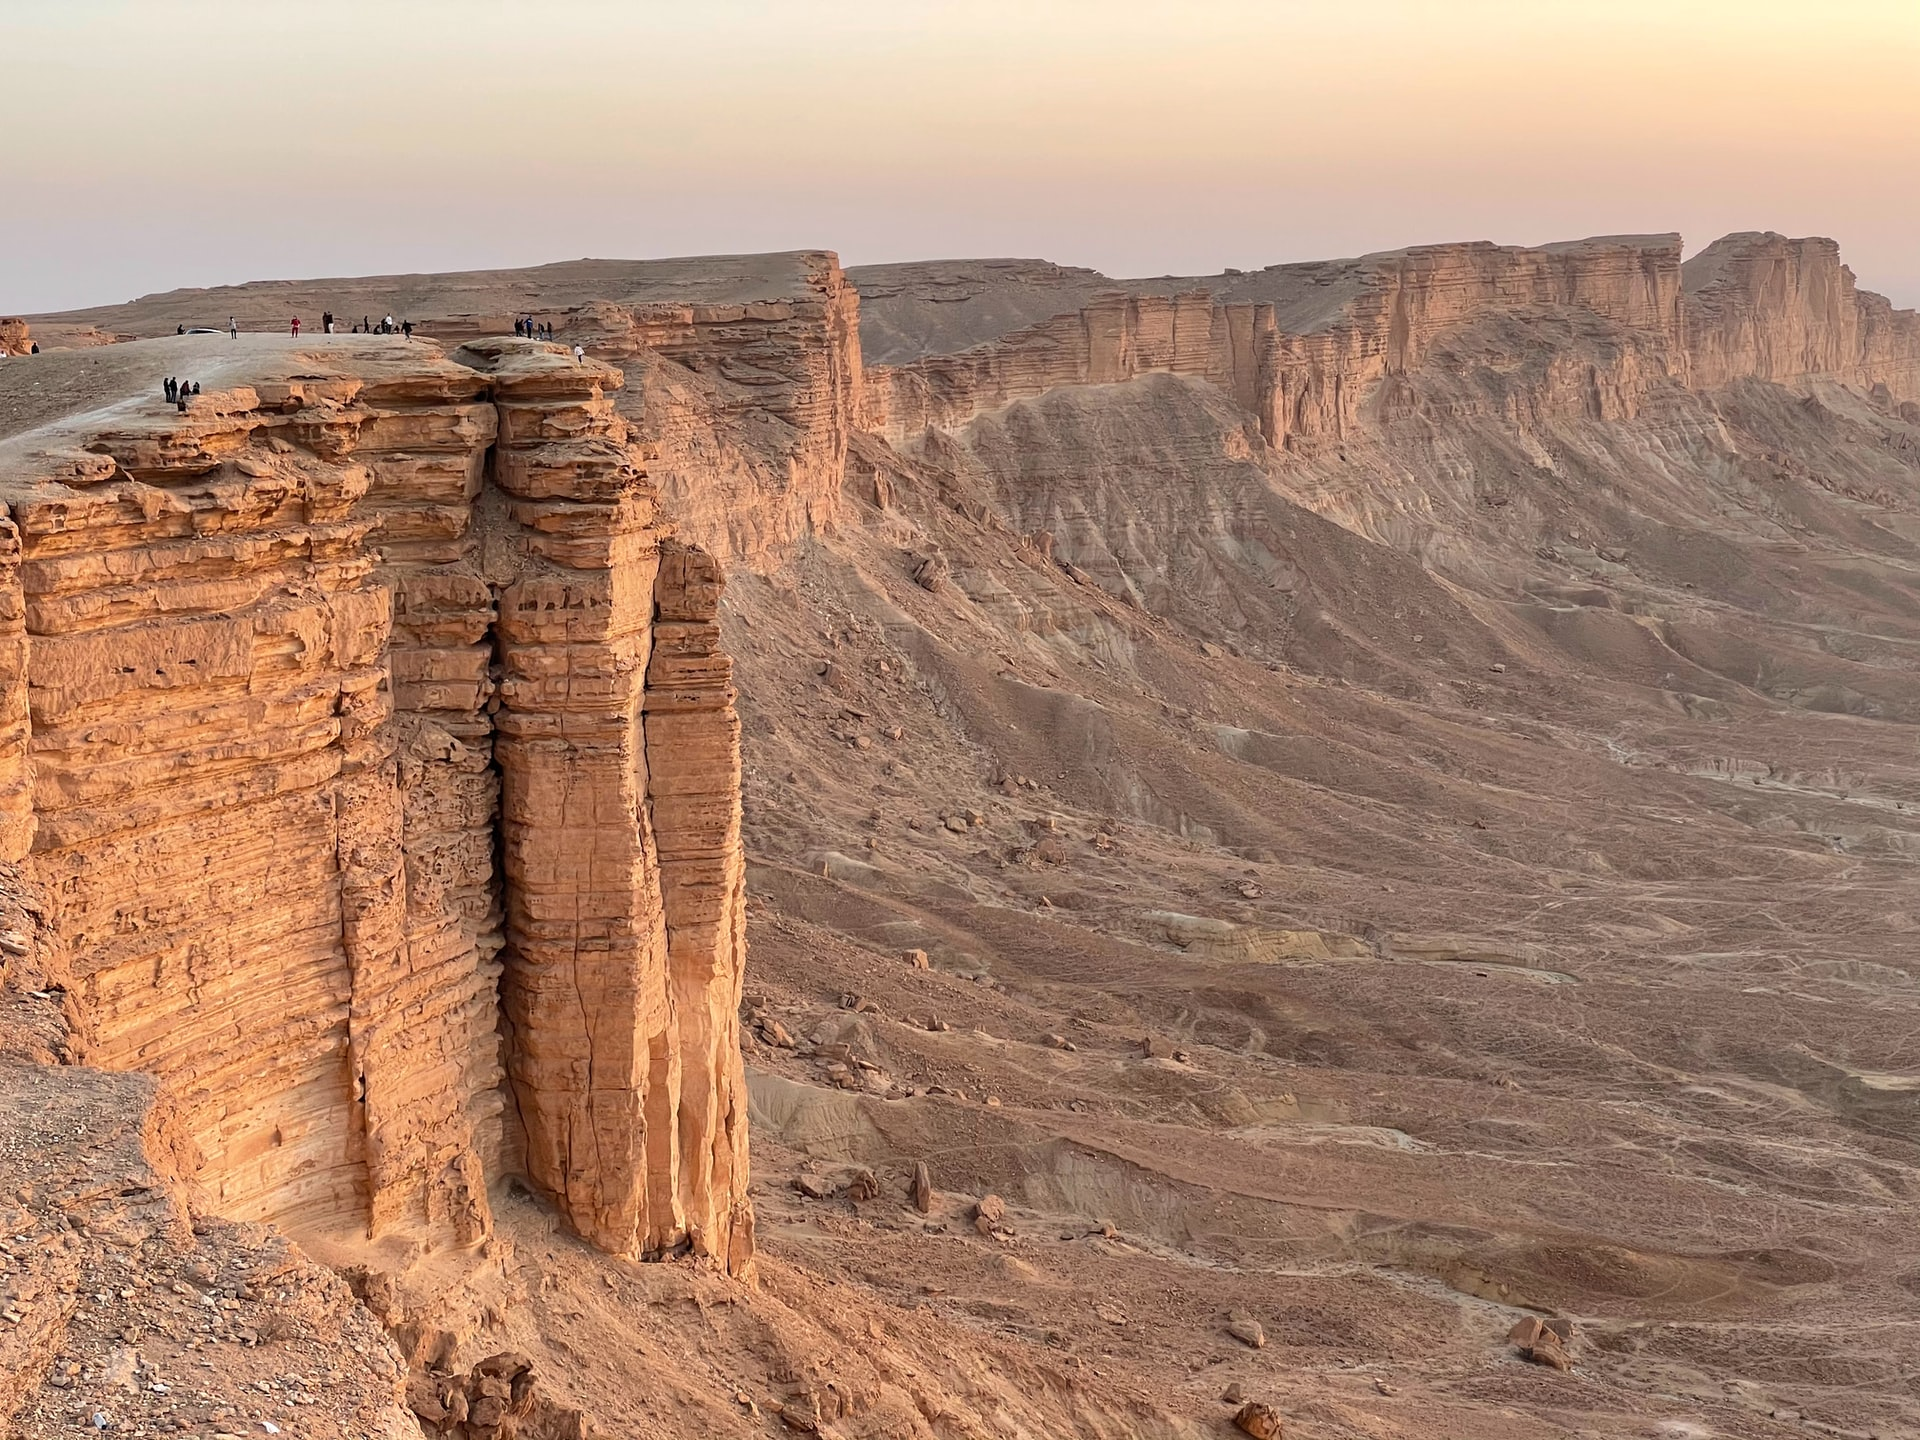 Rand van de wereld (foto: Khalid Elkady)